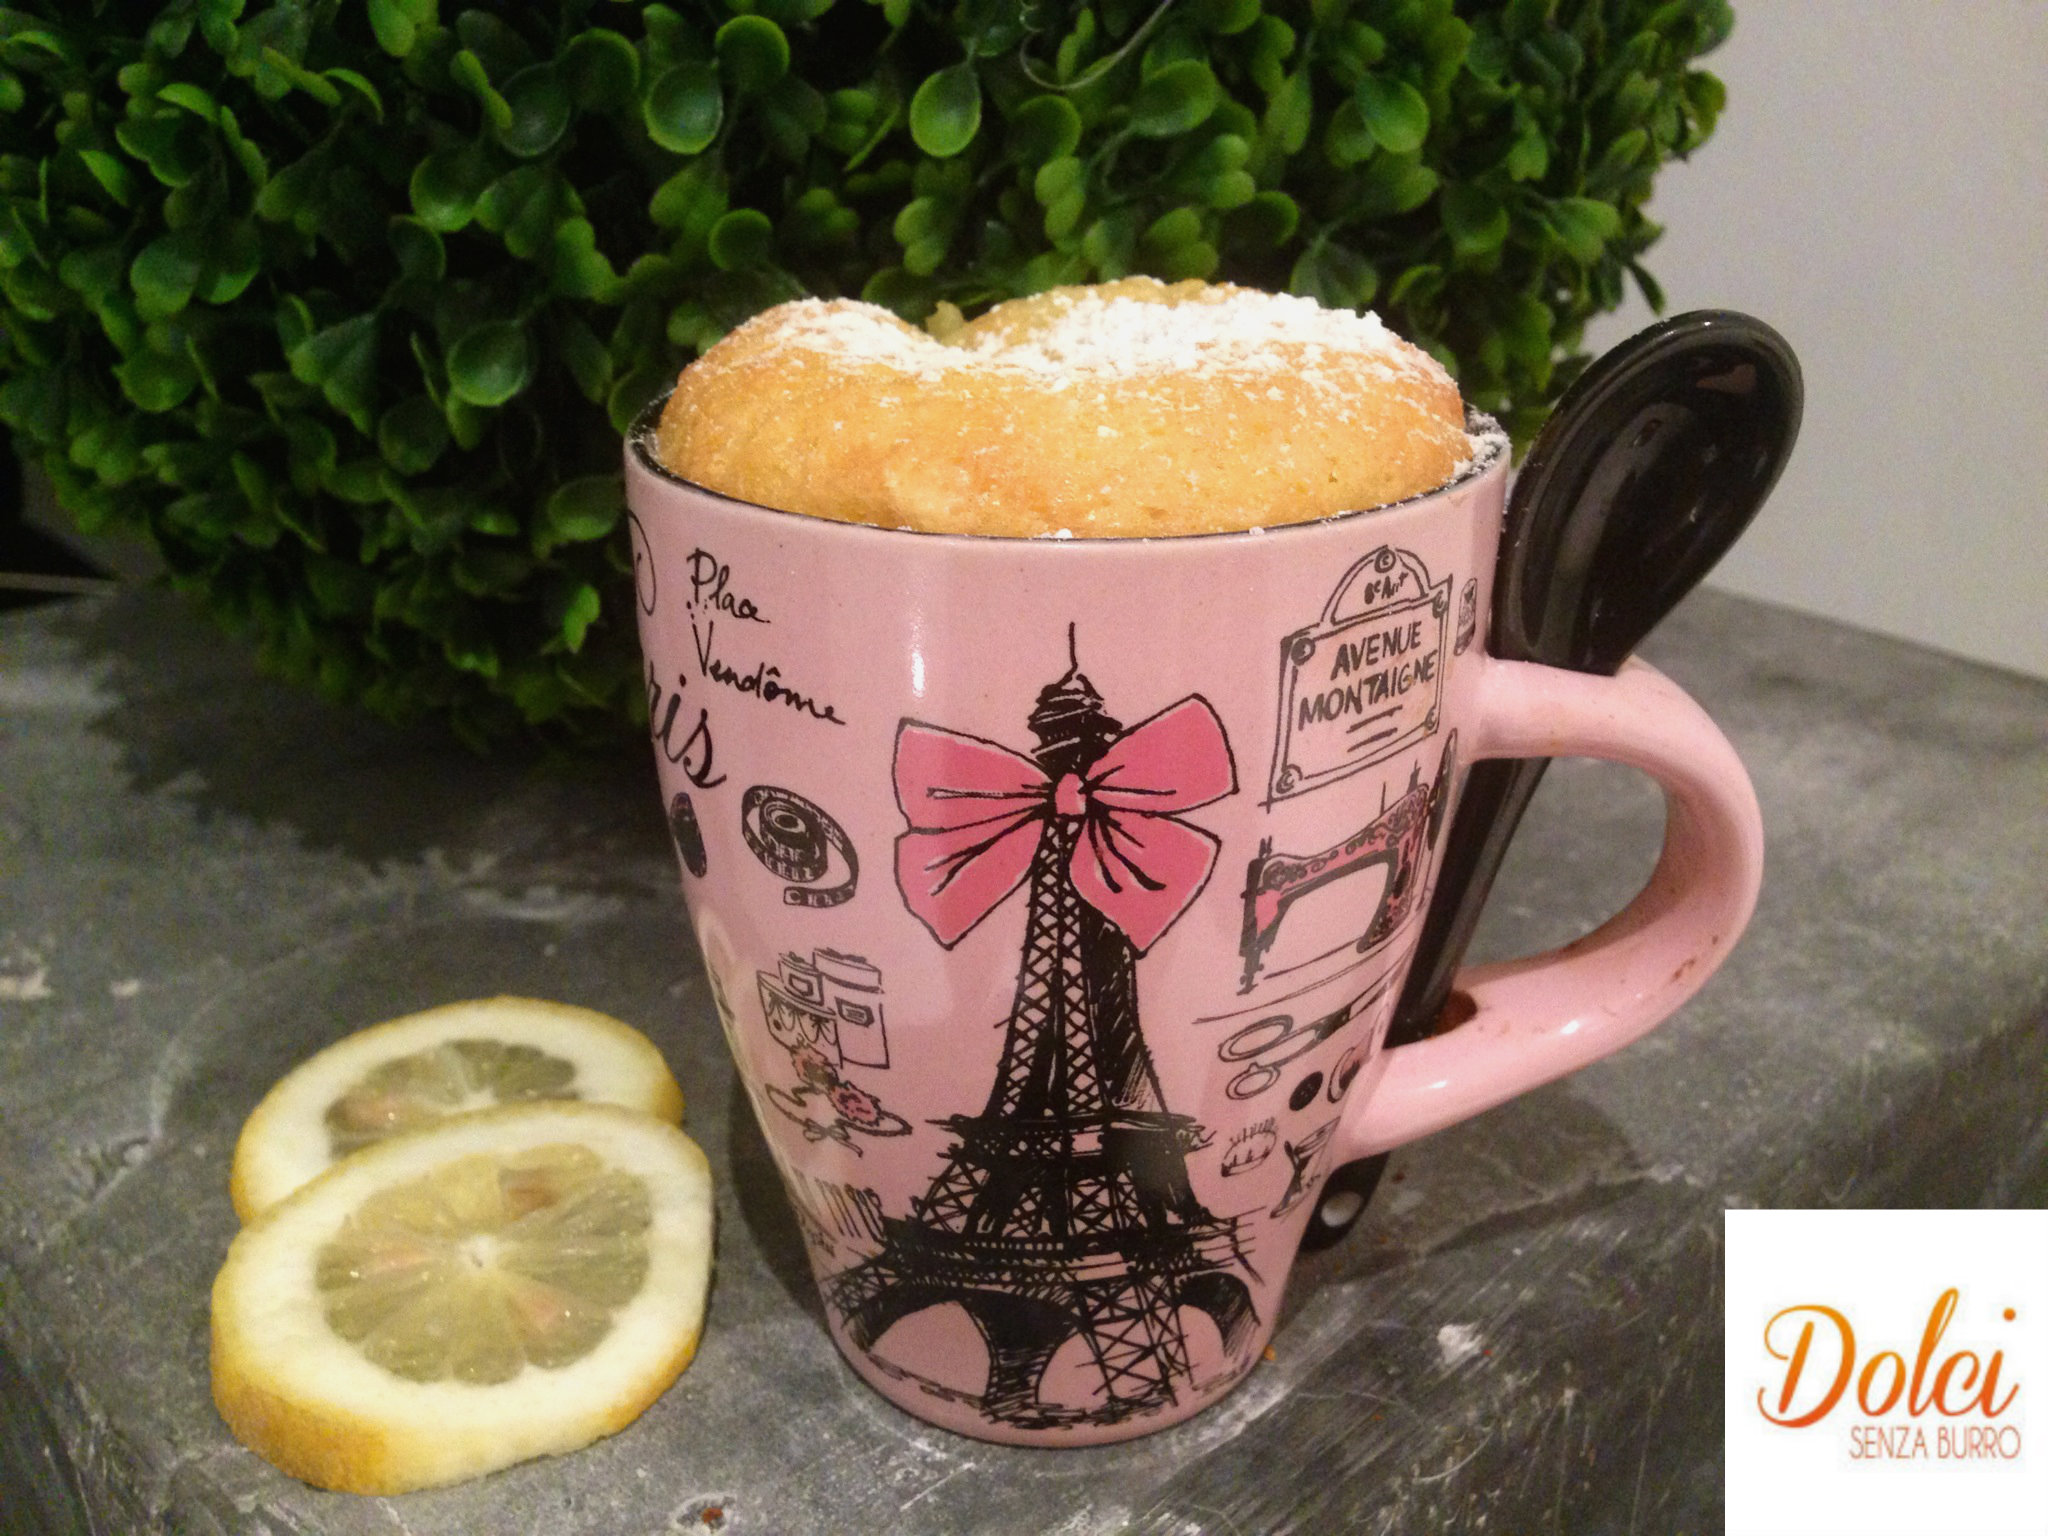 Lemon Mug Cake Senza burro - Dolci Senza Burro